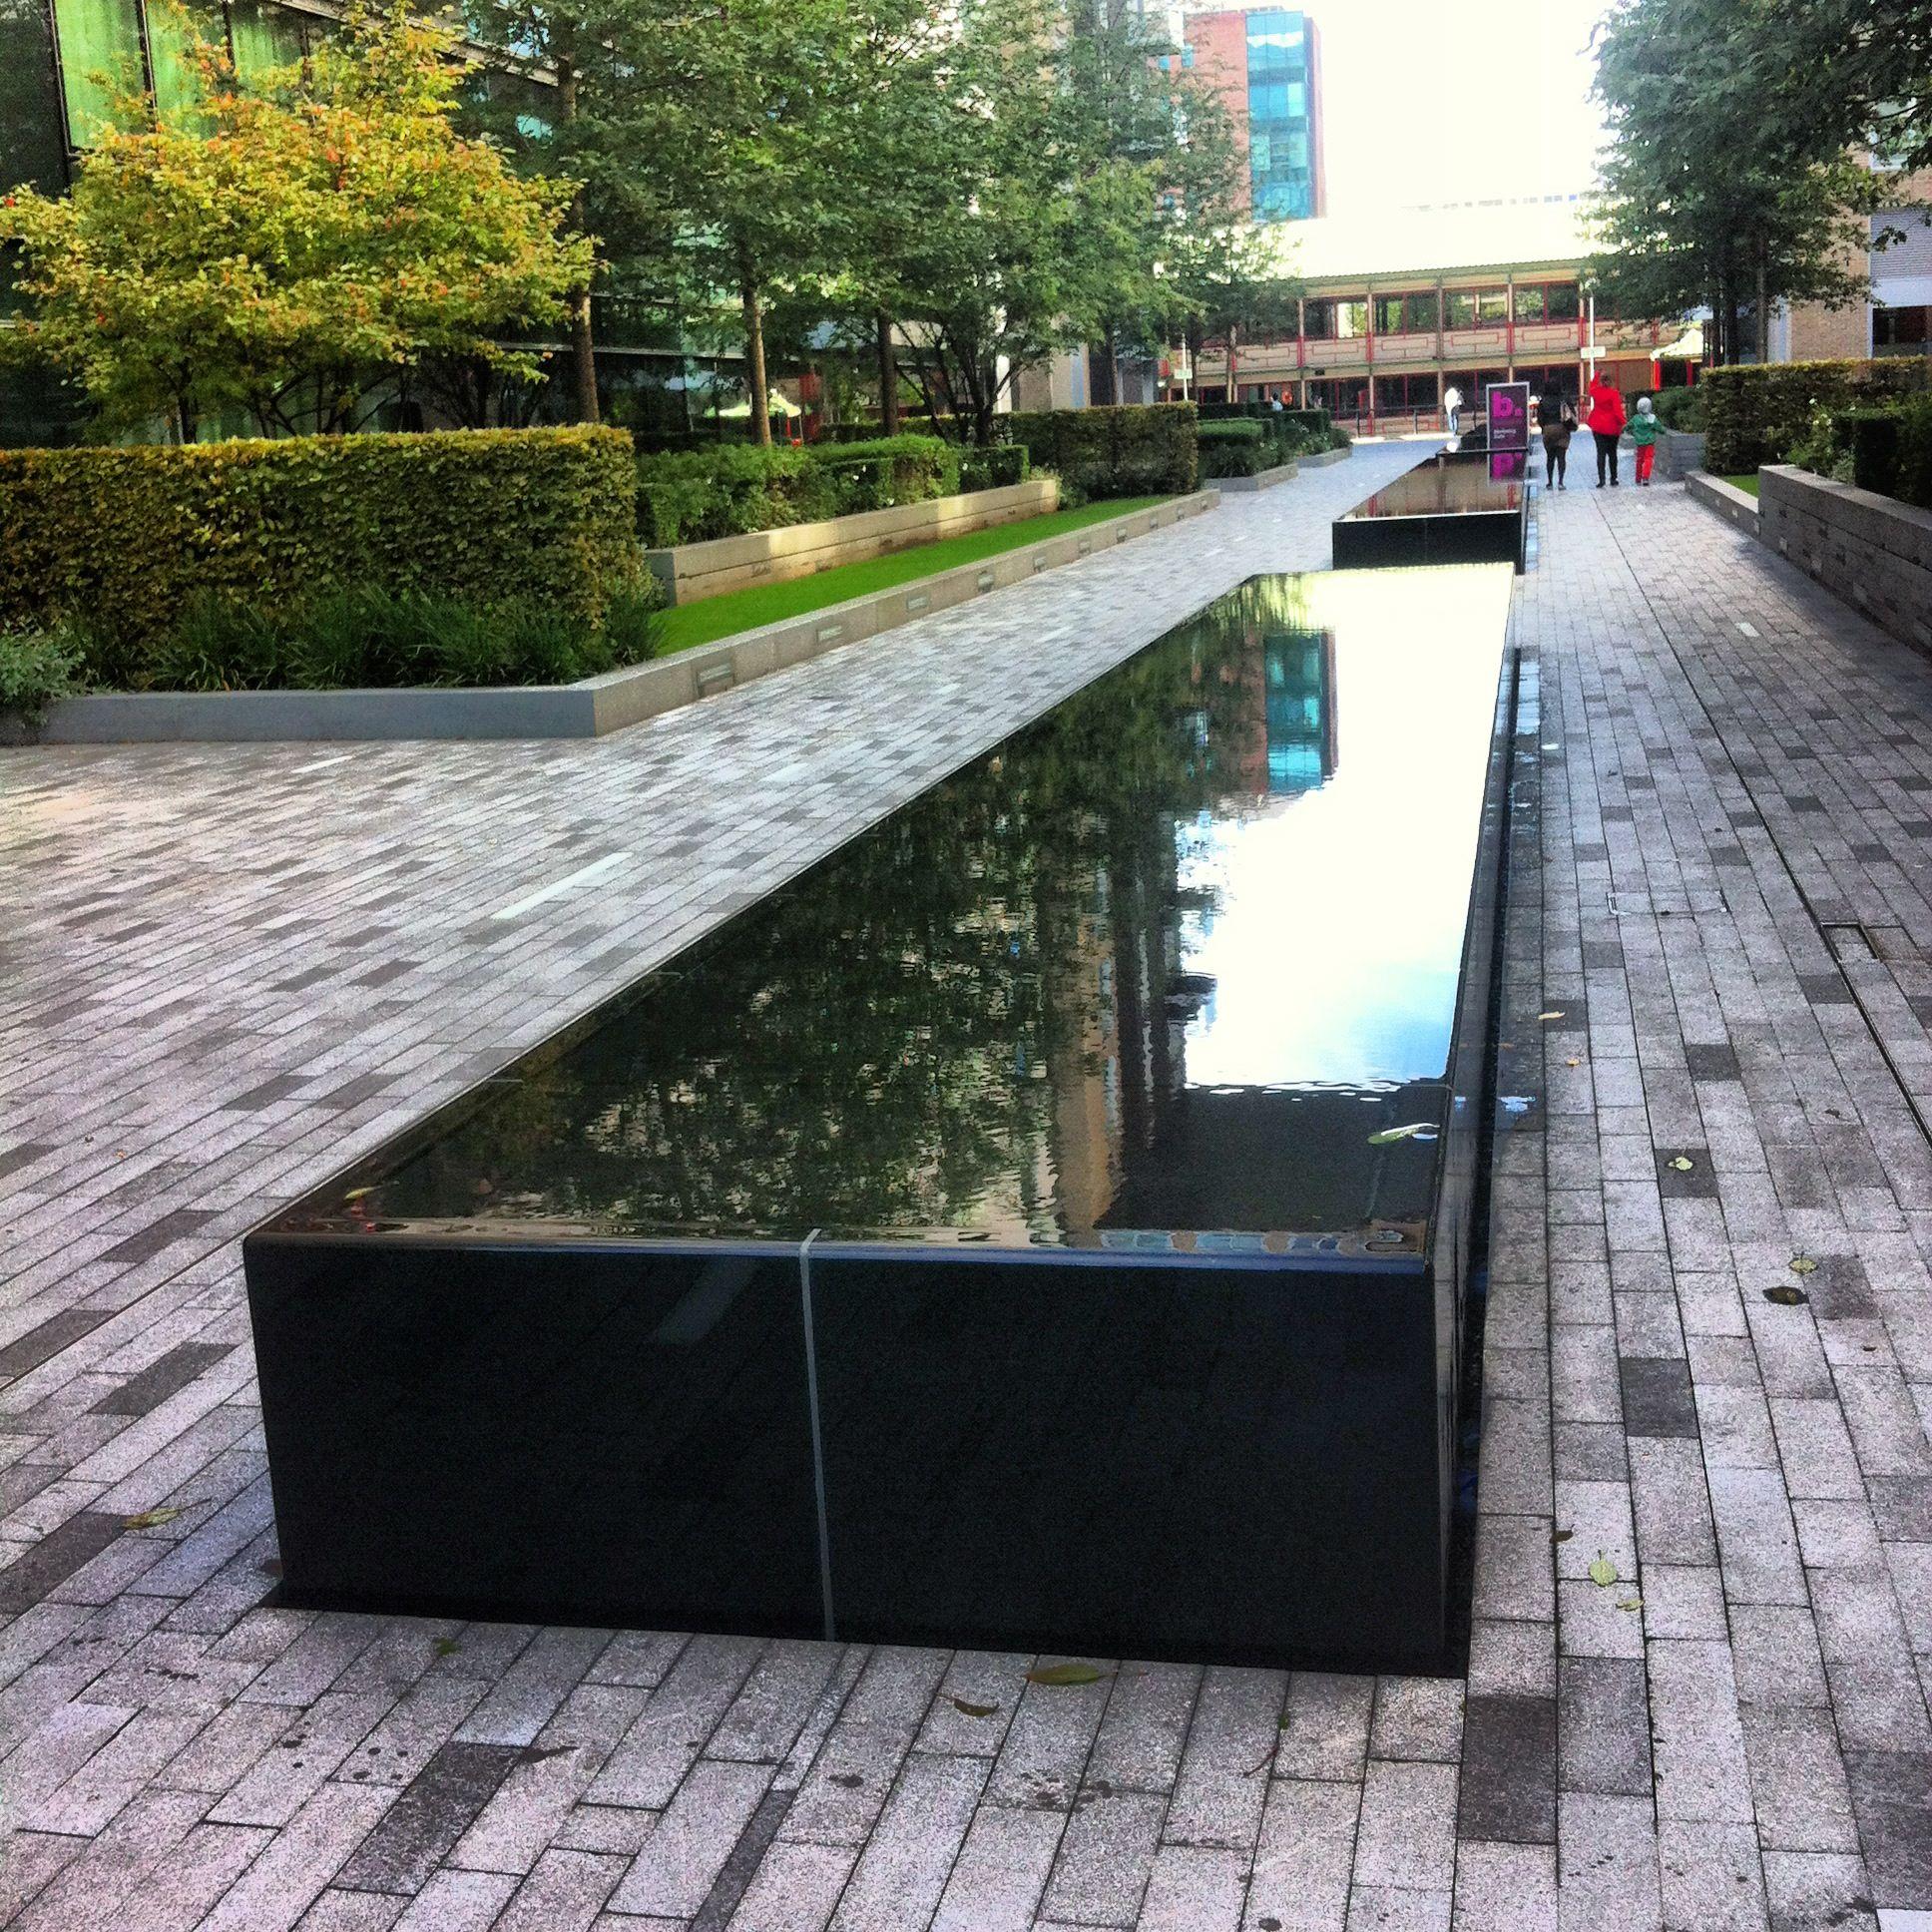 Baltimore Wharf Cube Mirror Water Feature Modern Water